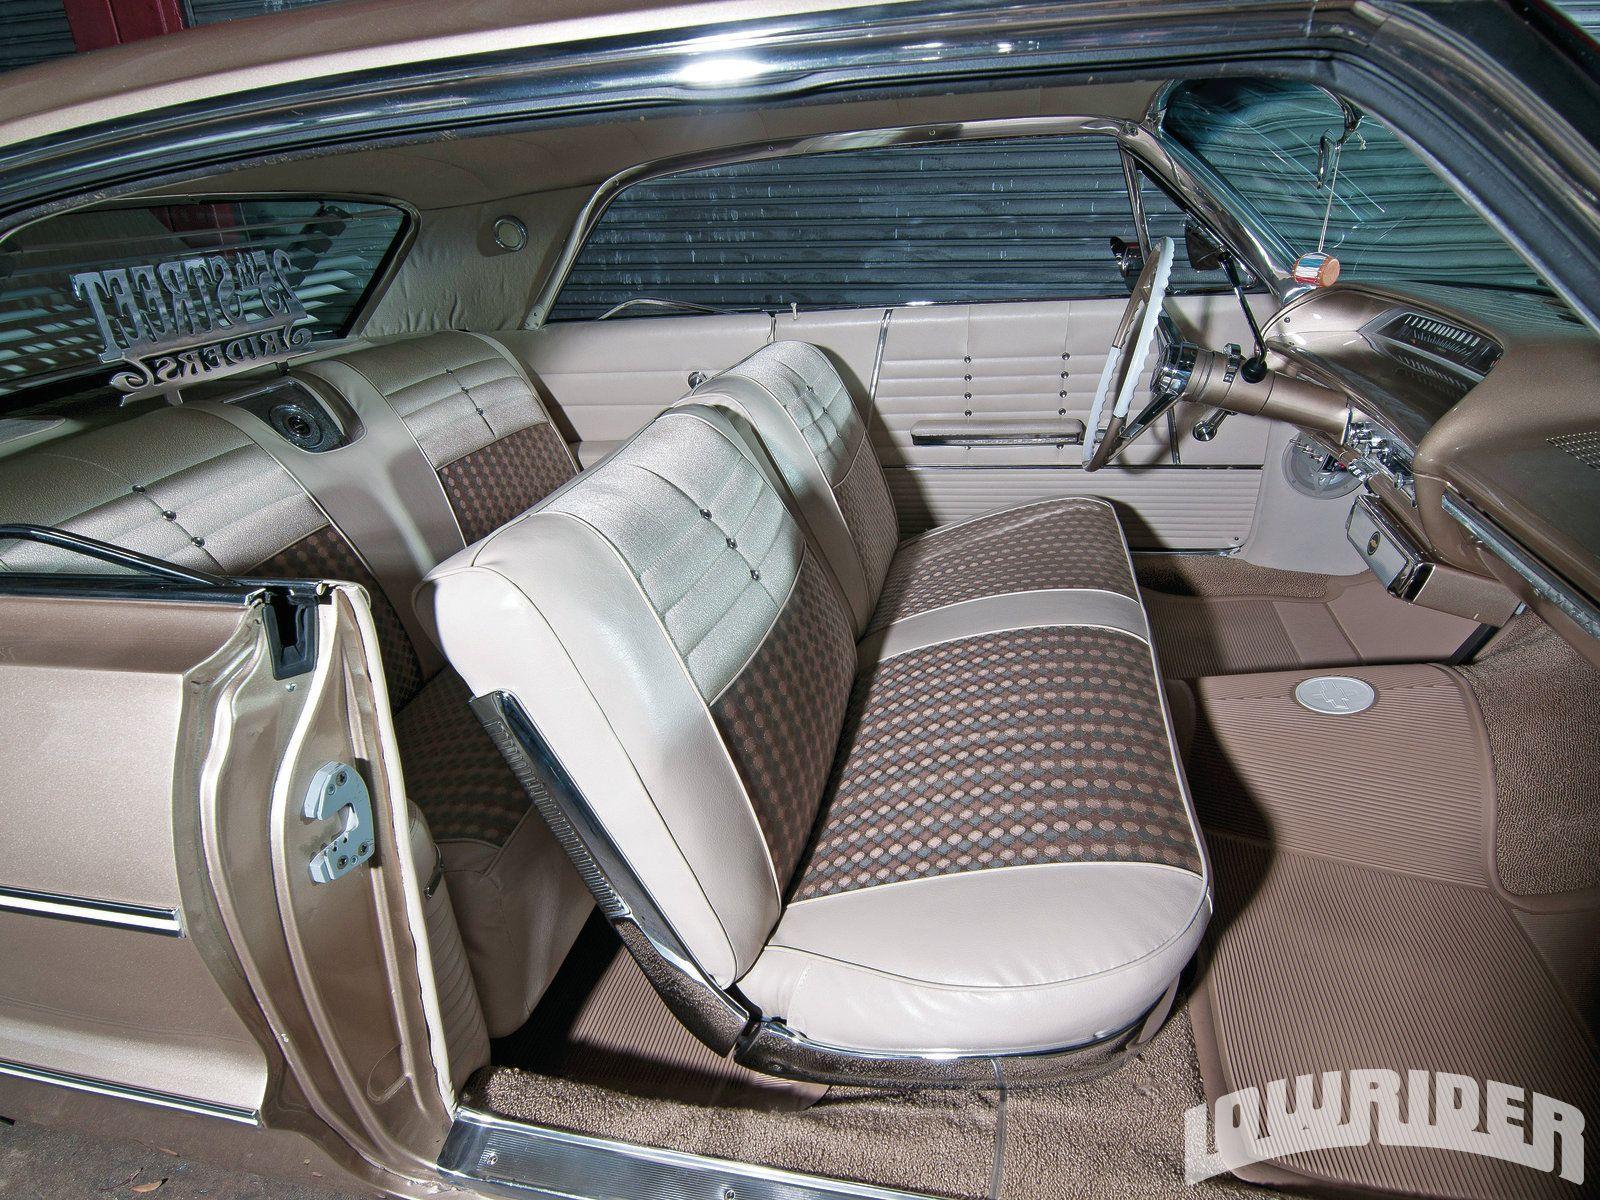 1964 Chevrolet Impala Custom Interior Chevrolet Impala